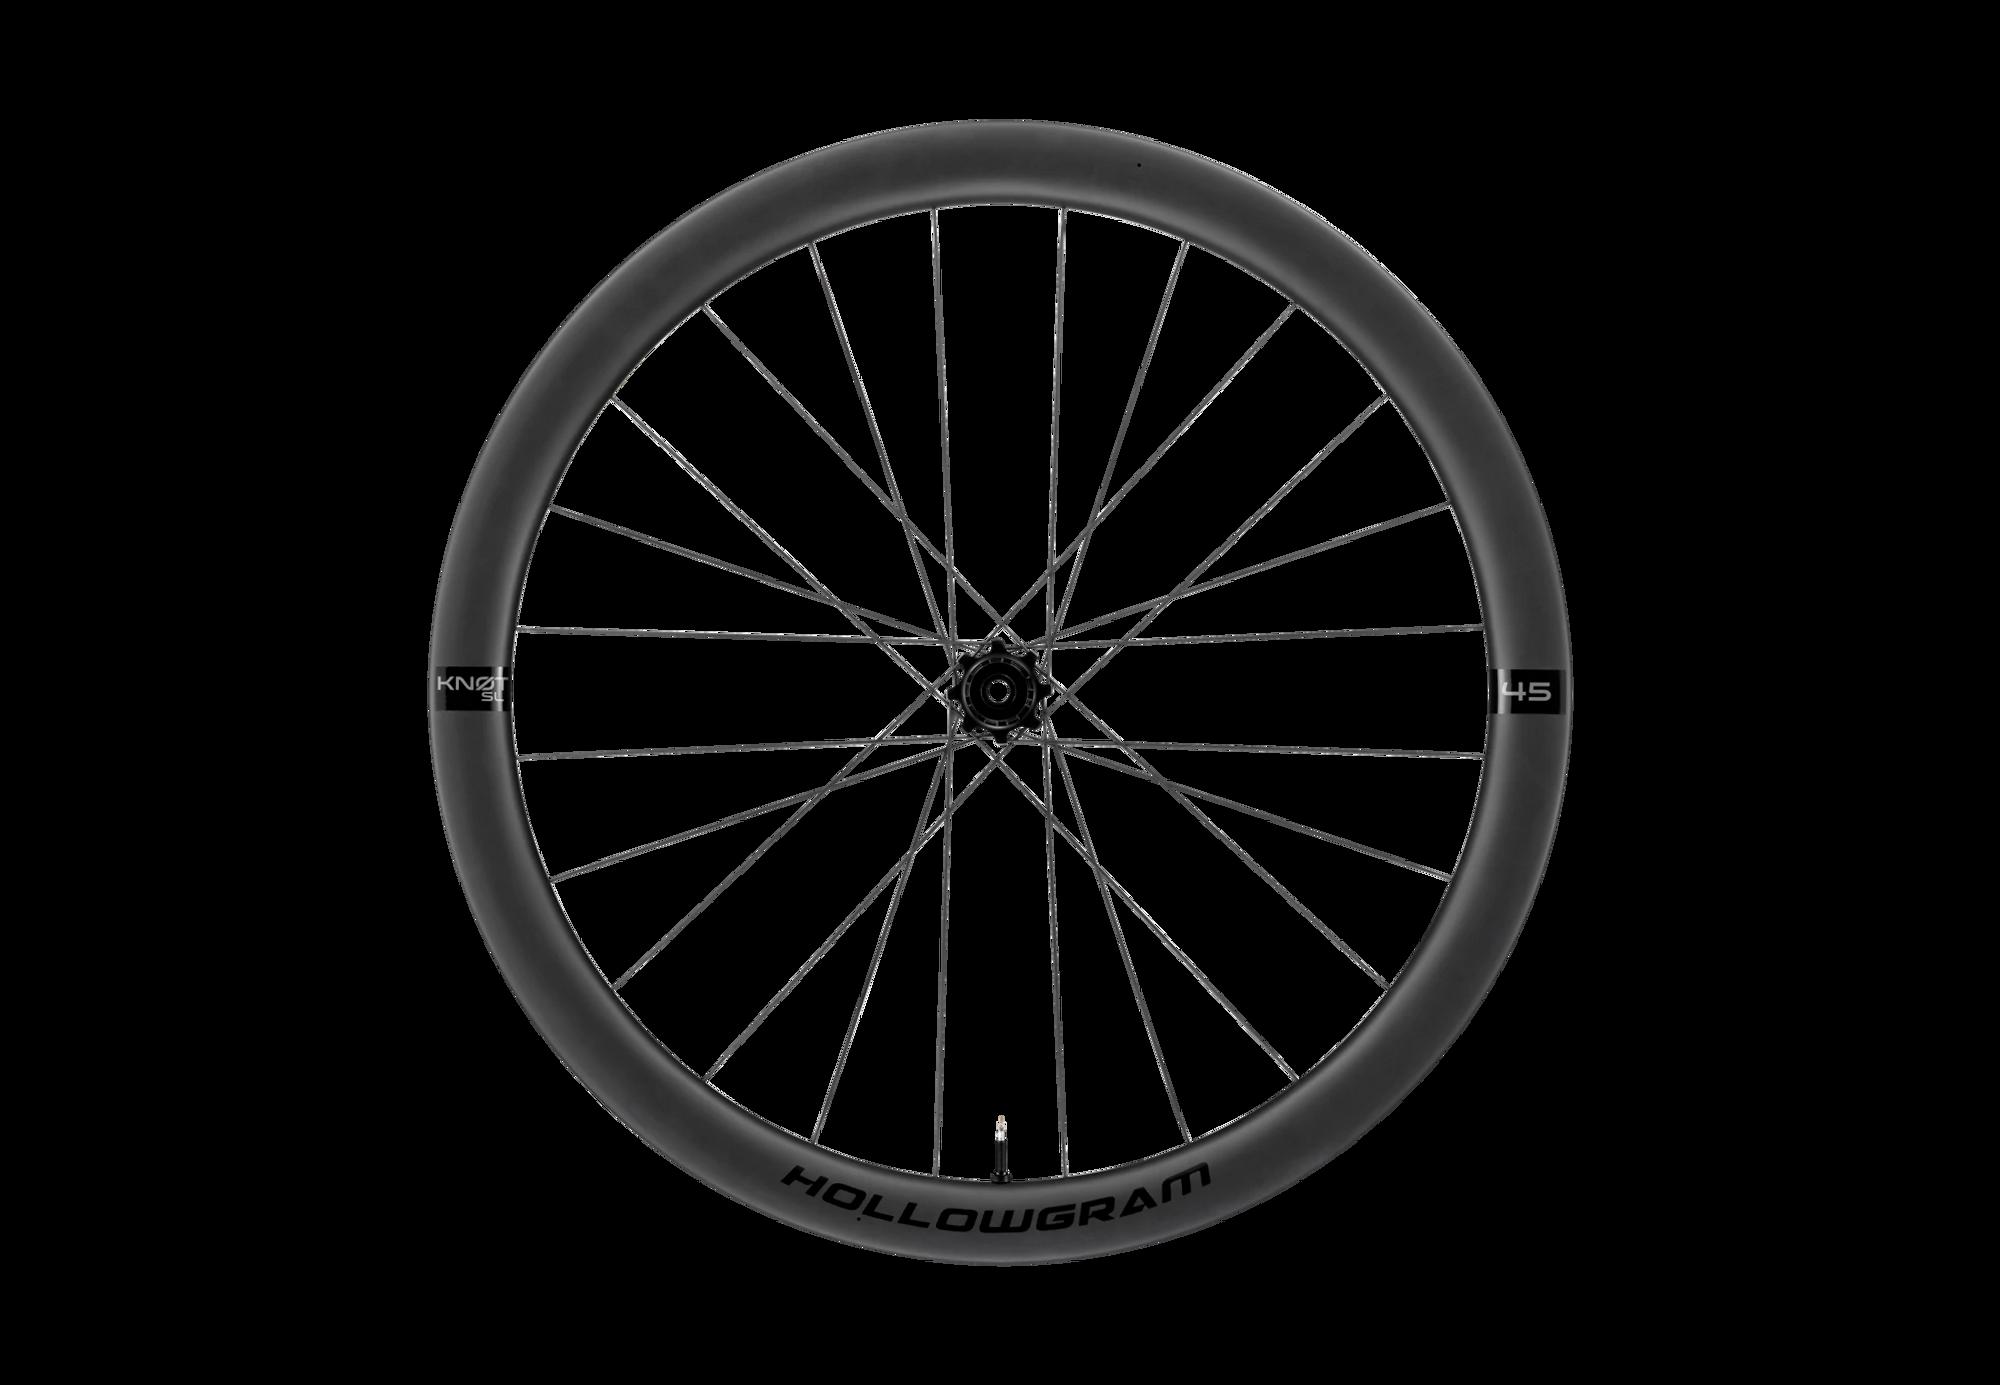 HollowGram 45 SL KNØT Wheel 142x12 SRAM XDR Detail Image